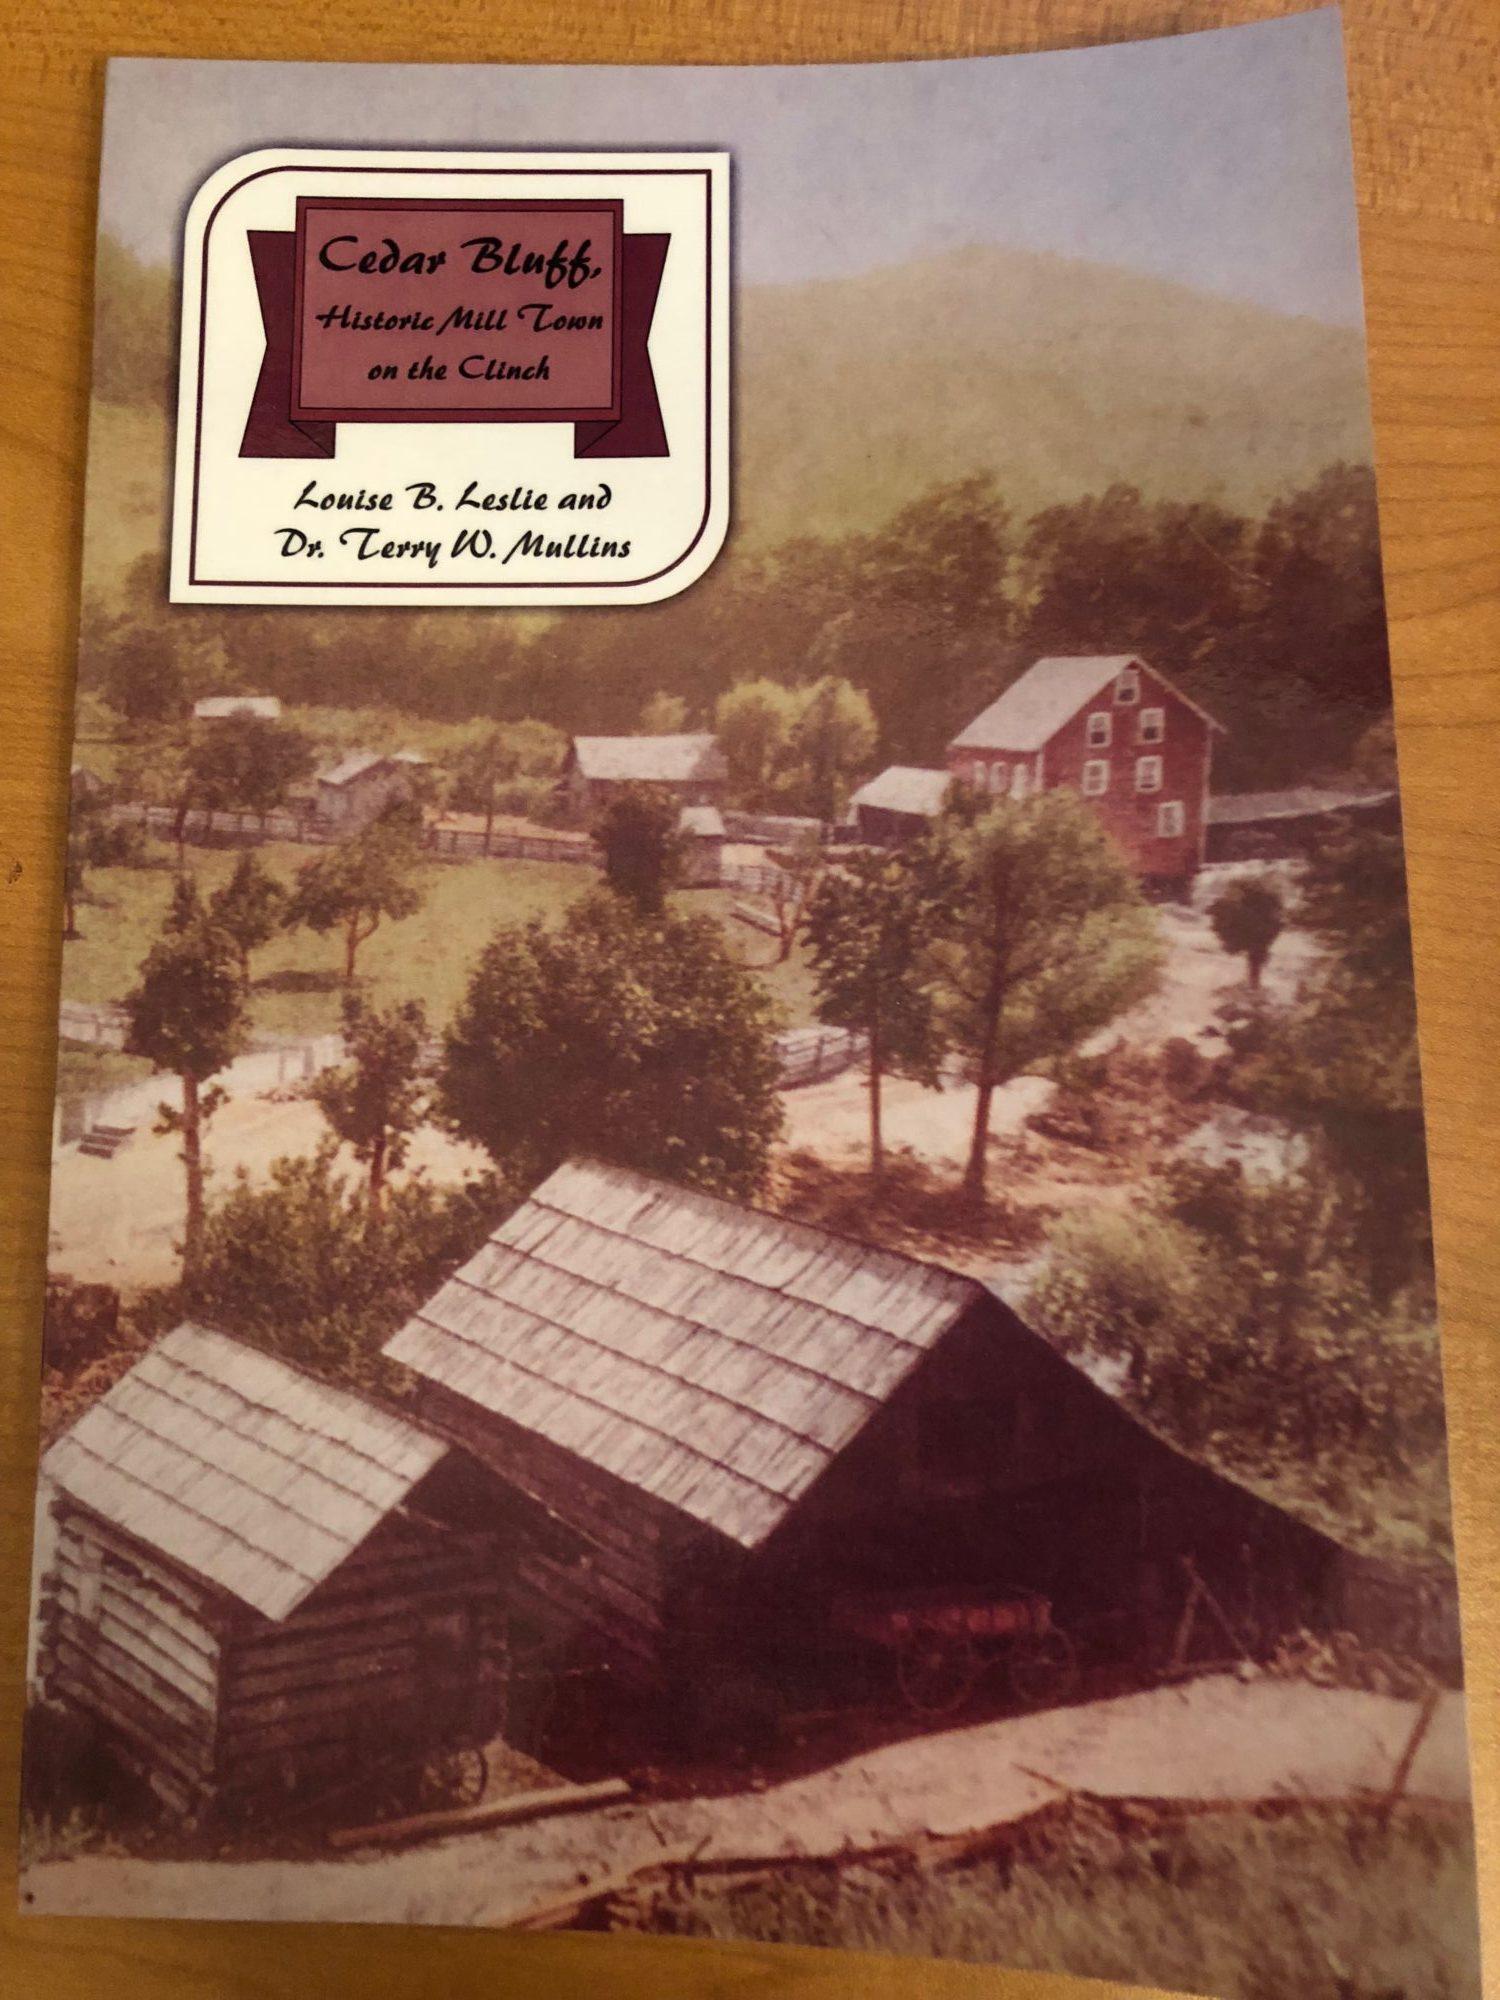 Cedar bluff historic mill town on the clinch tazewell for The cedar mill